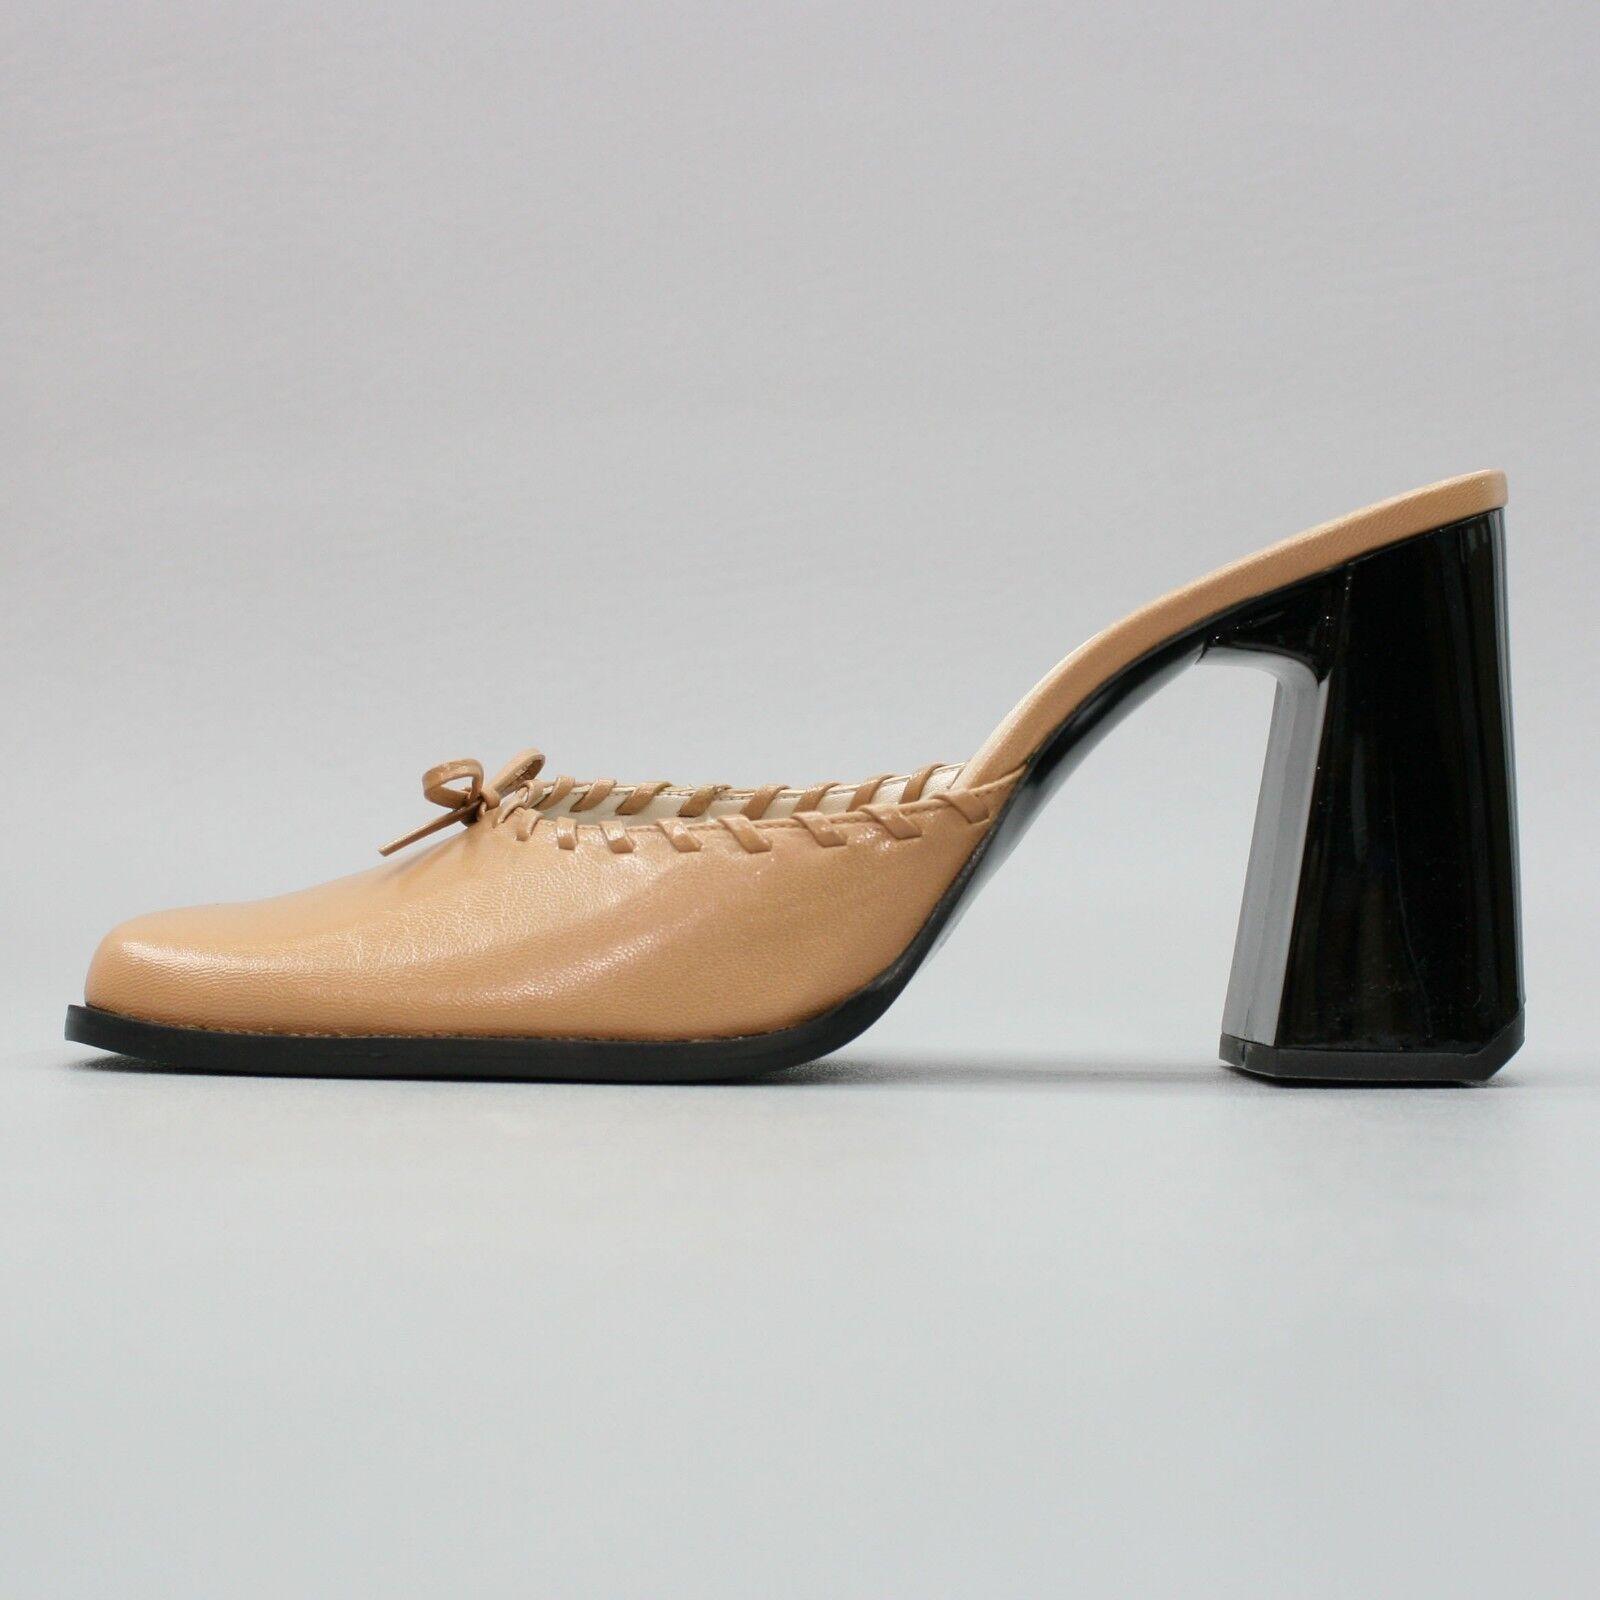 Aldo Ladies 40 (about 9) Tan Leather Pump 4